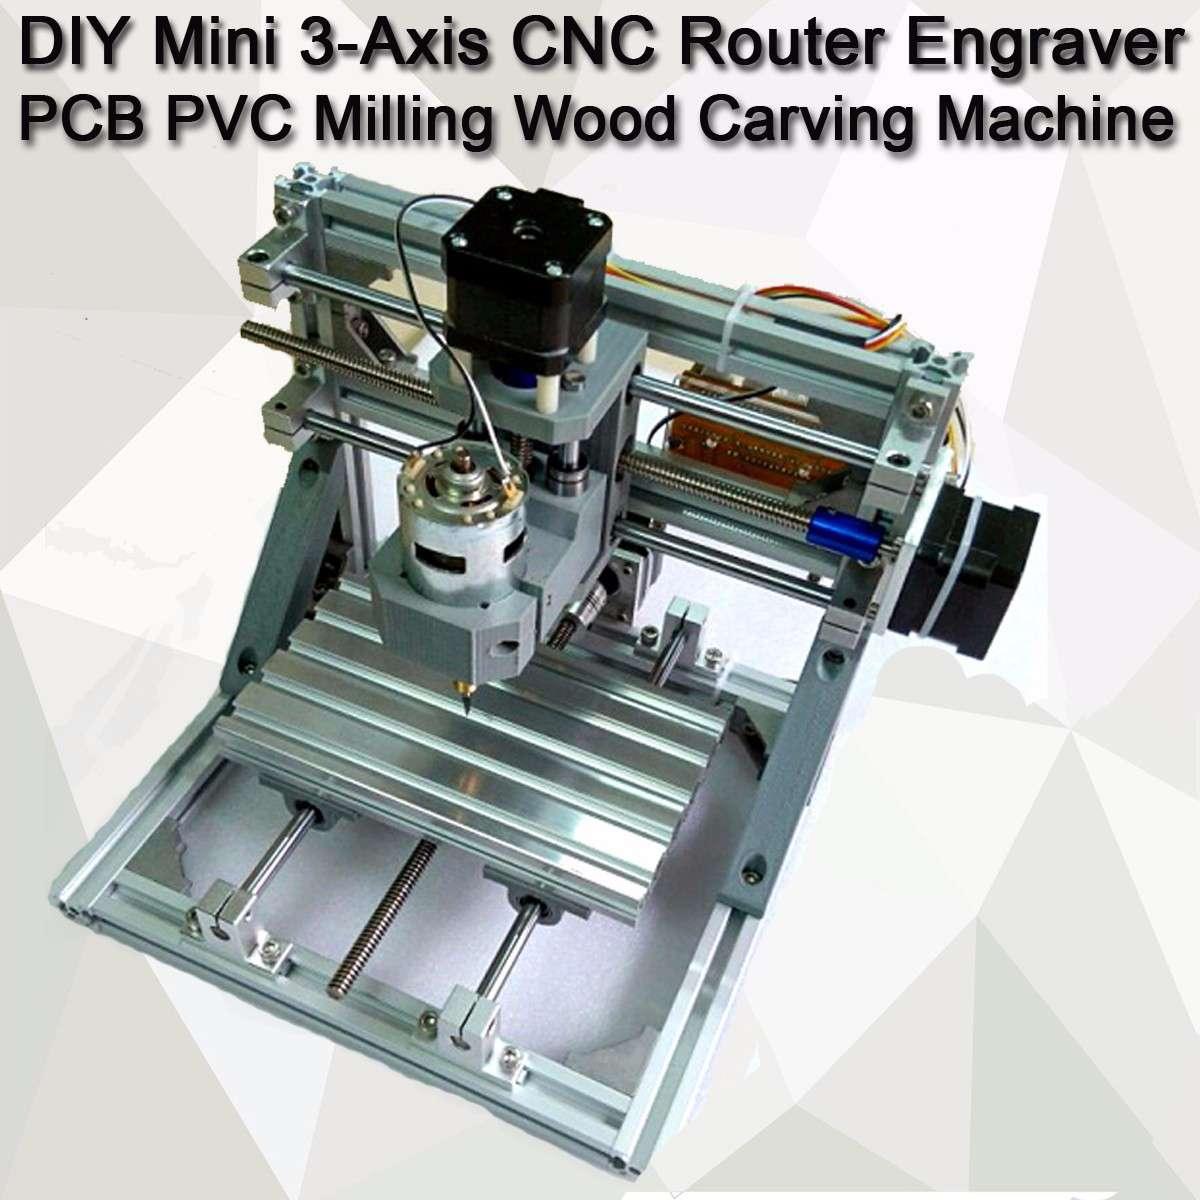 DIY Mini 3 Axis CNC Router Engraver PCB PVC Milling Wood Carving Machine DIY MDIY Mini 3 Axis CNC Router Engraver PCB PVC Milling Wood Carving Machine DIY M